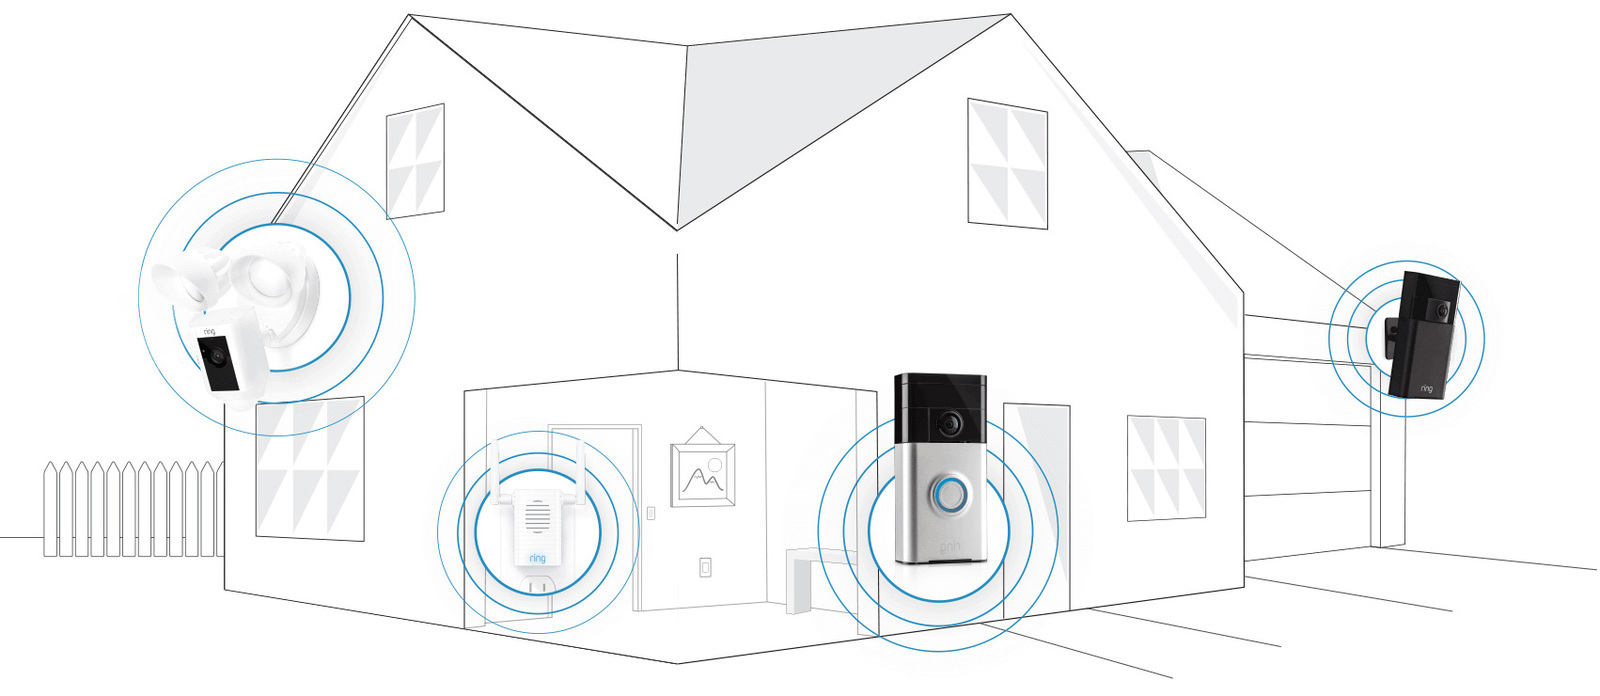 Ring: Video Doorbell - Satin Nickel image